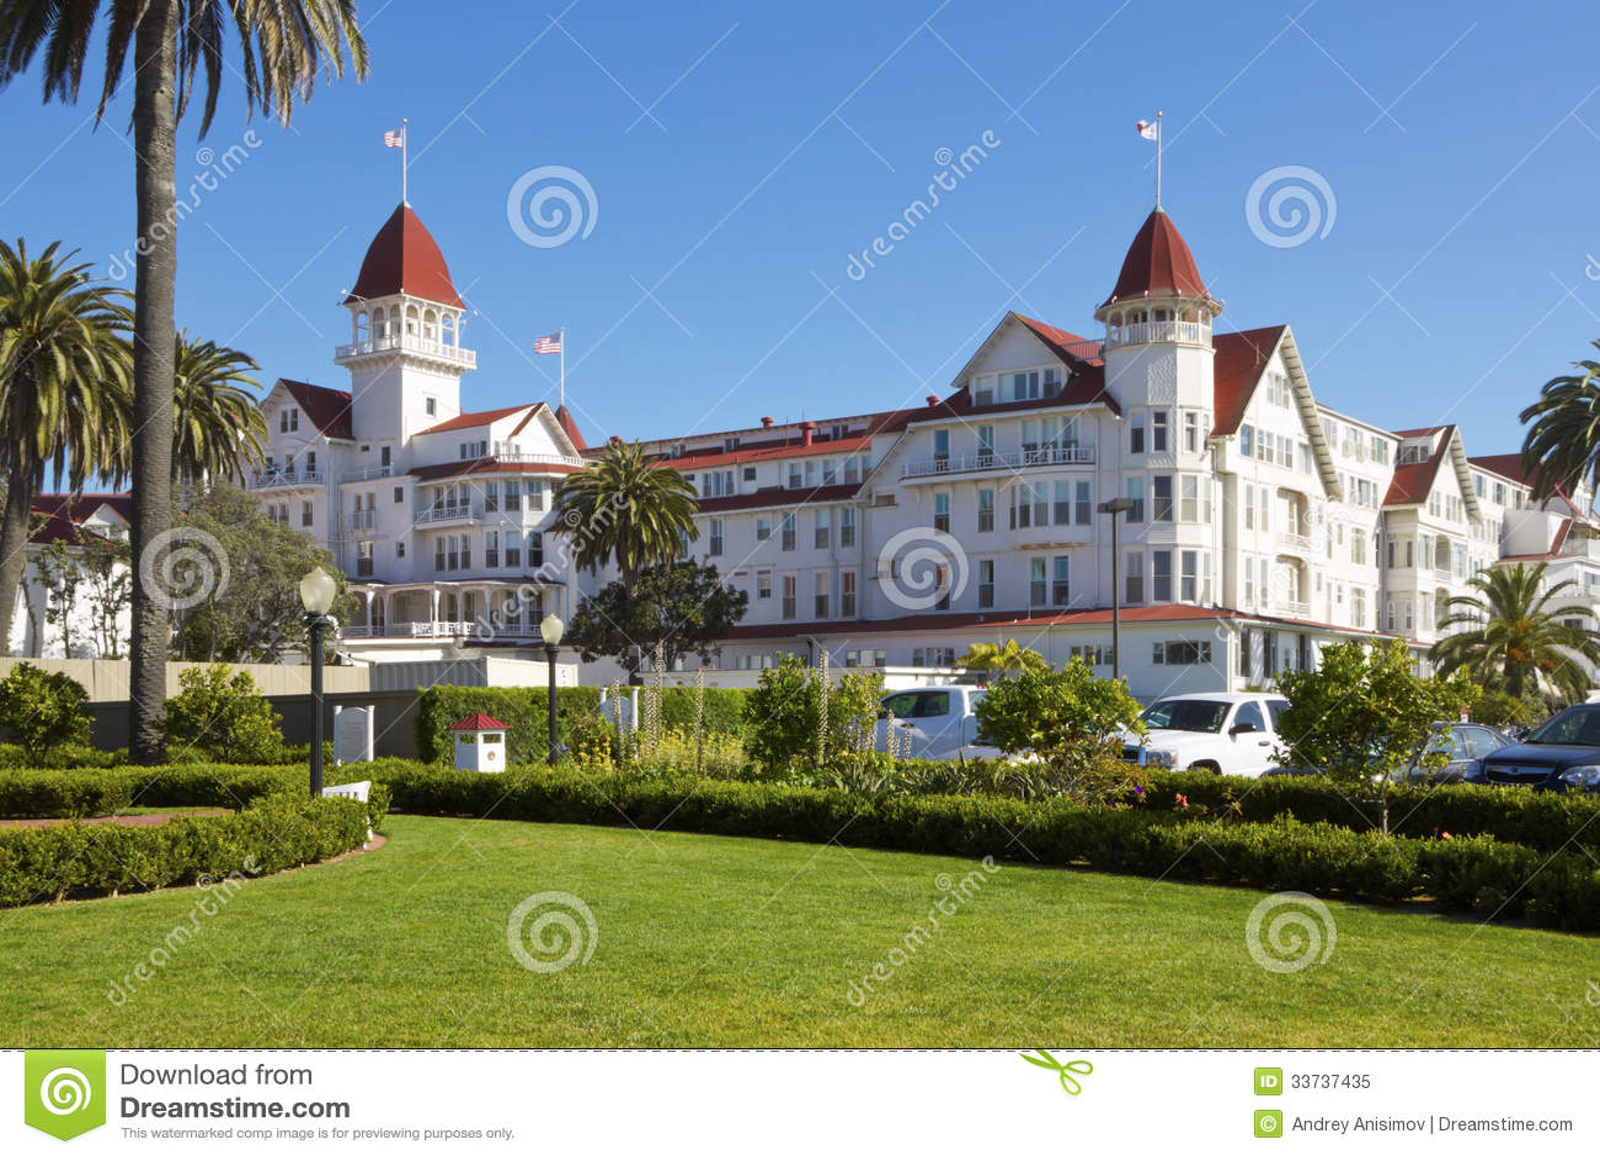 Hotel Del Coronado in San Diego, California, USA